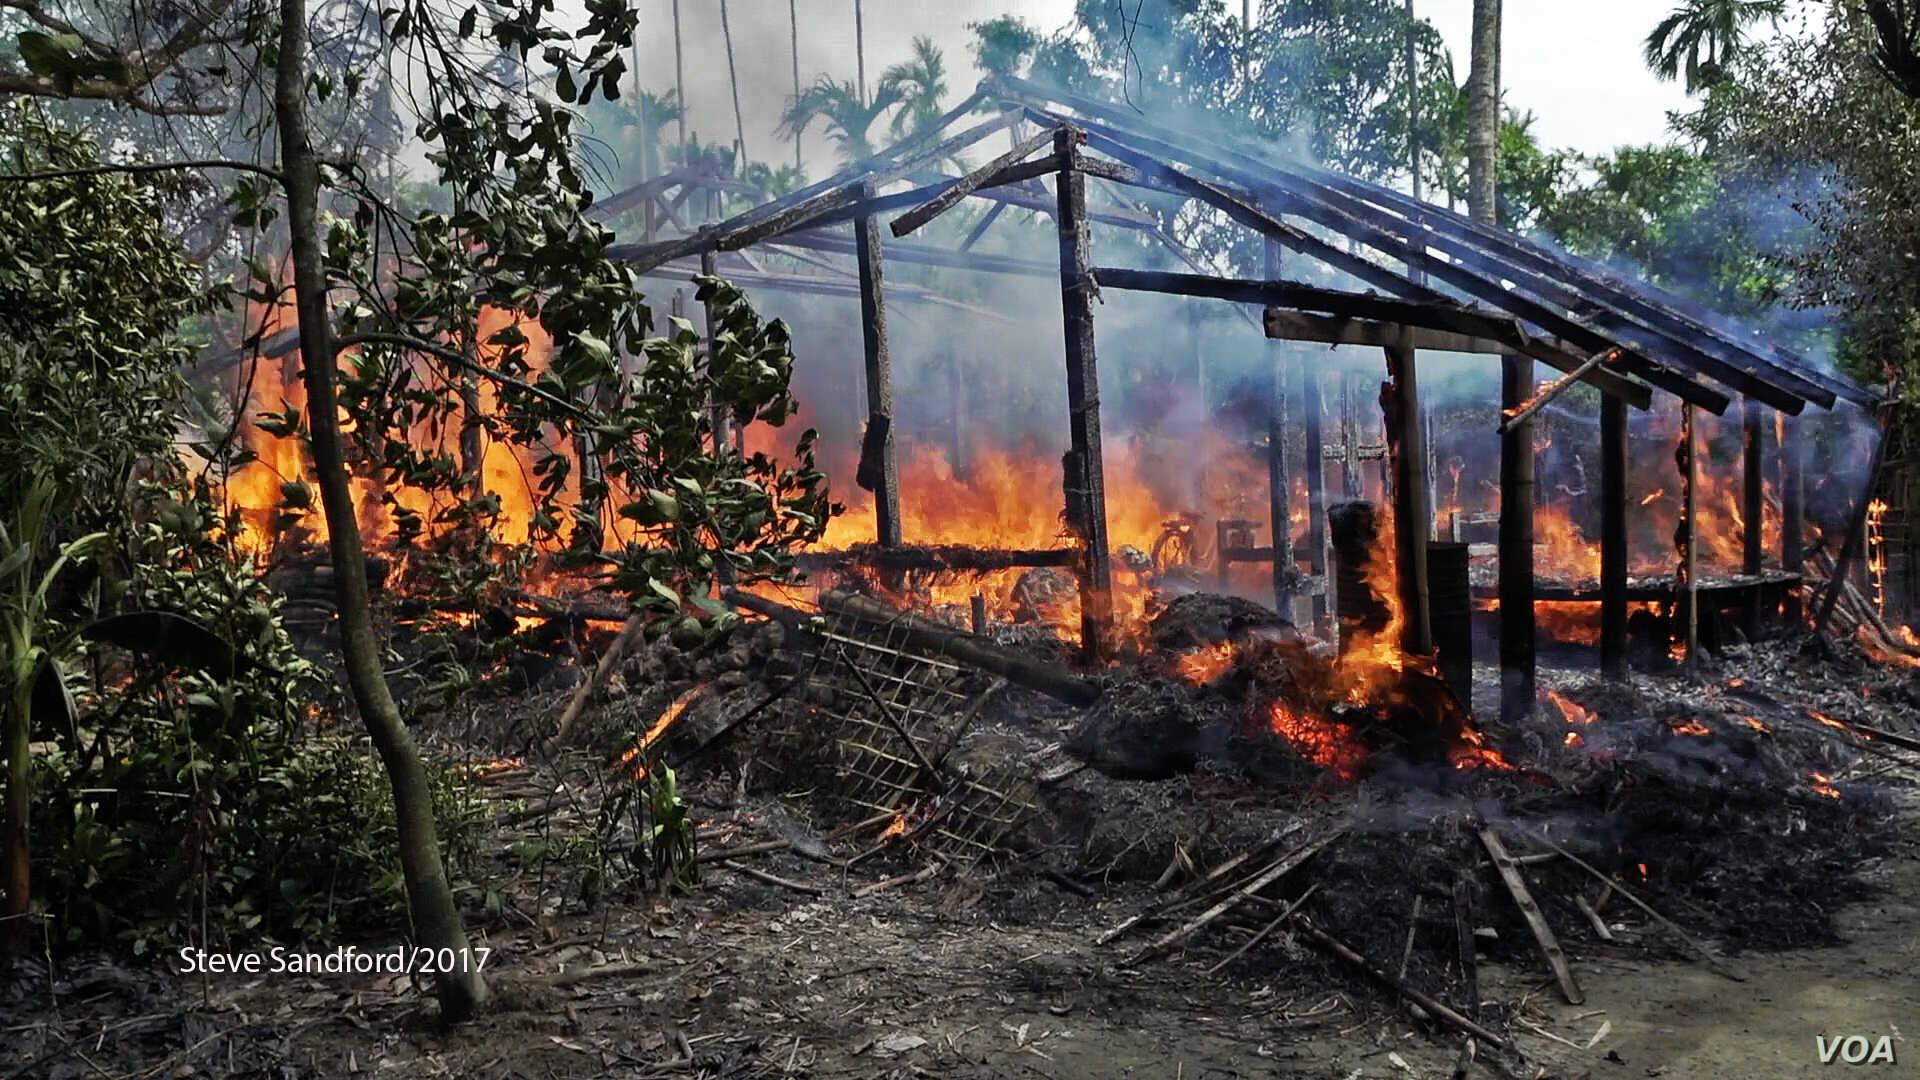 बांग्लादेश नरसंहार bangladesh Genocide